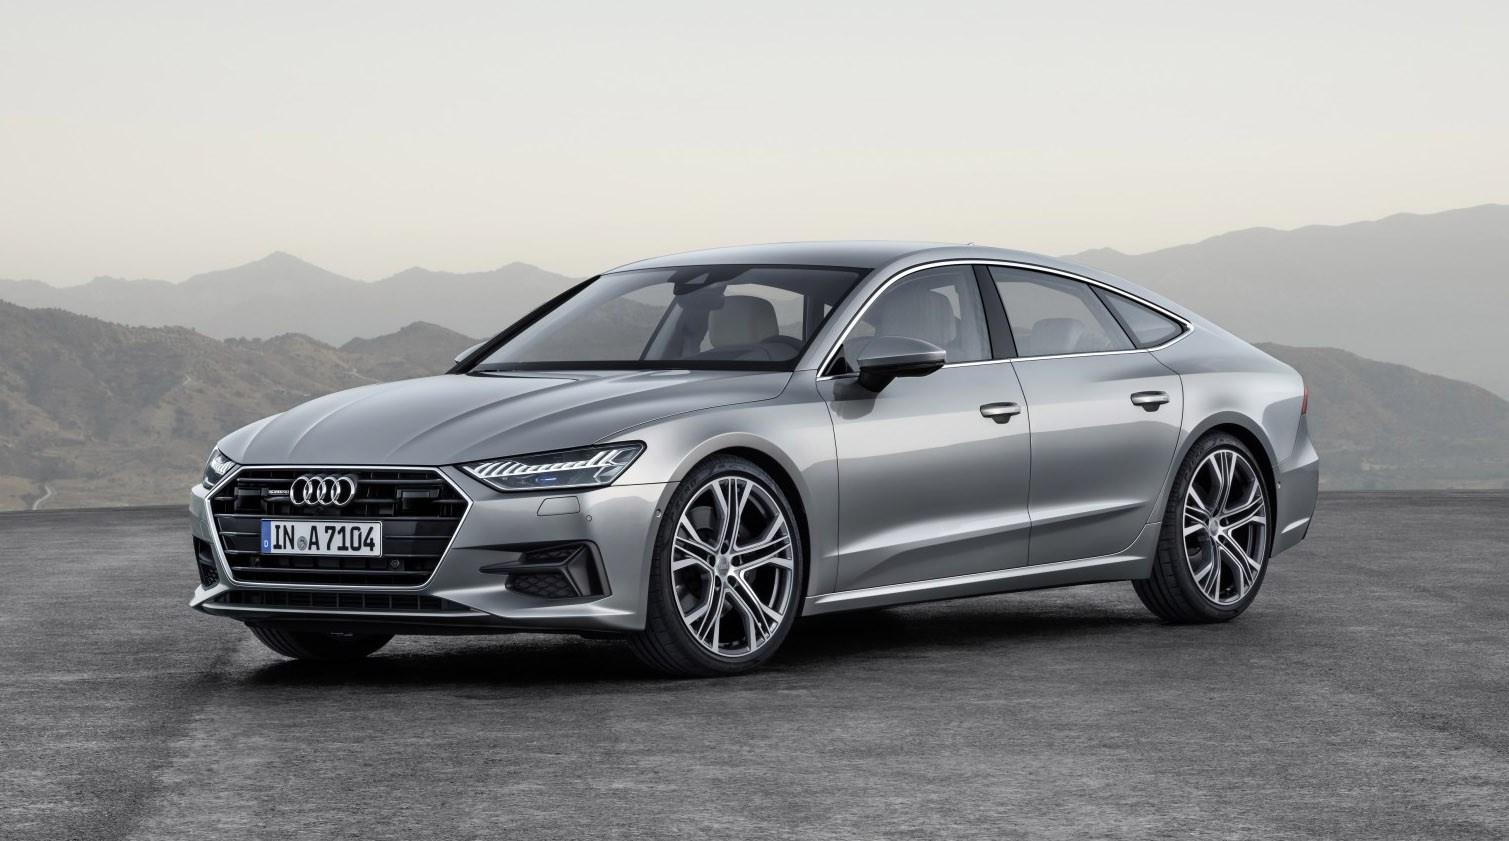 Audi A7 Sportback: sempre più tecnologica, vanta i nuovi fanali laser